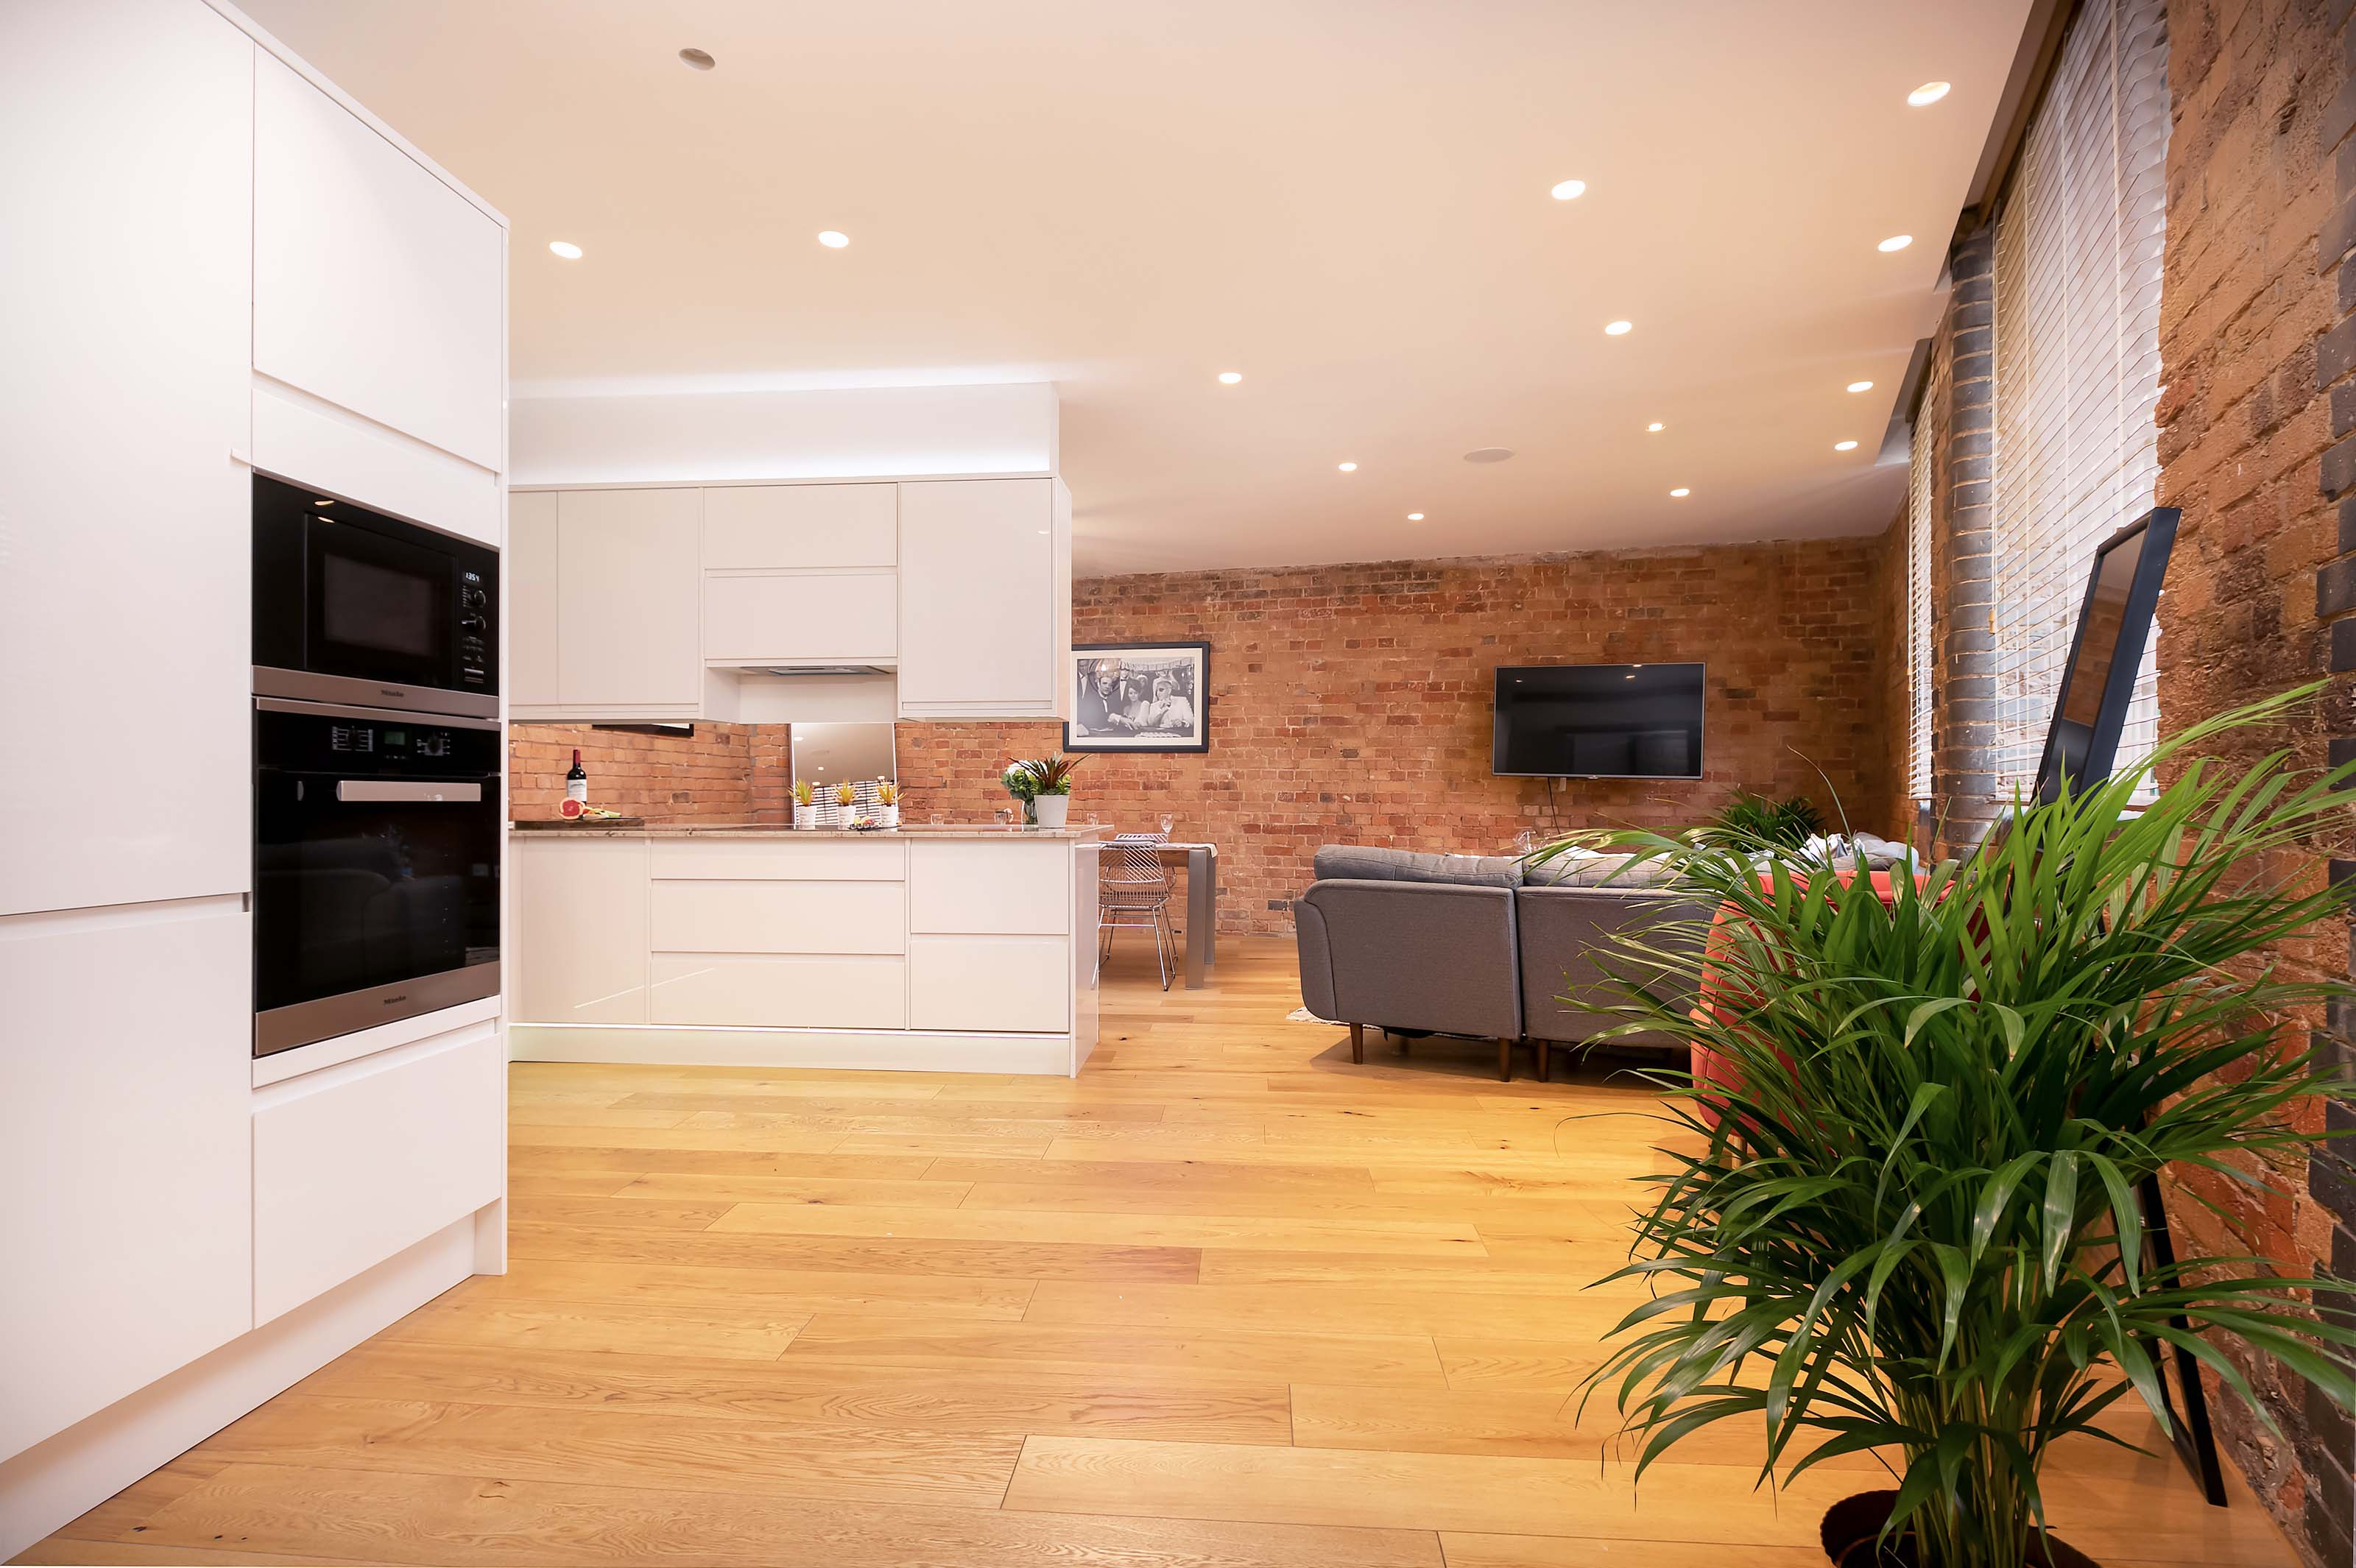 Lovelydays luxury service apartment rental - London - Fitzrovia - Wells Mews B - Lovelysuite - 2 bedrooms - 2 bathrooms - Luxury living room - 6565826101c9 - Lovelydays